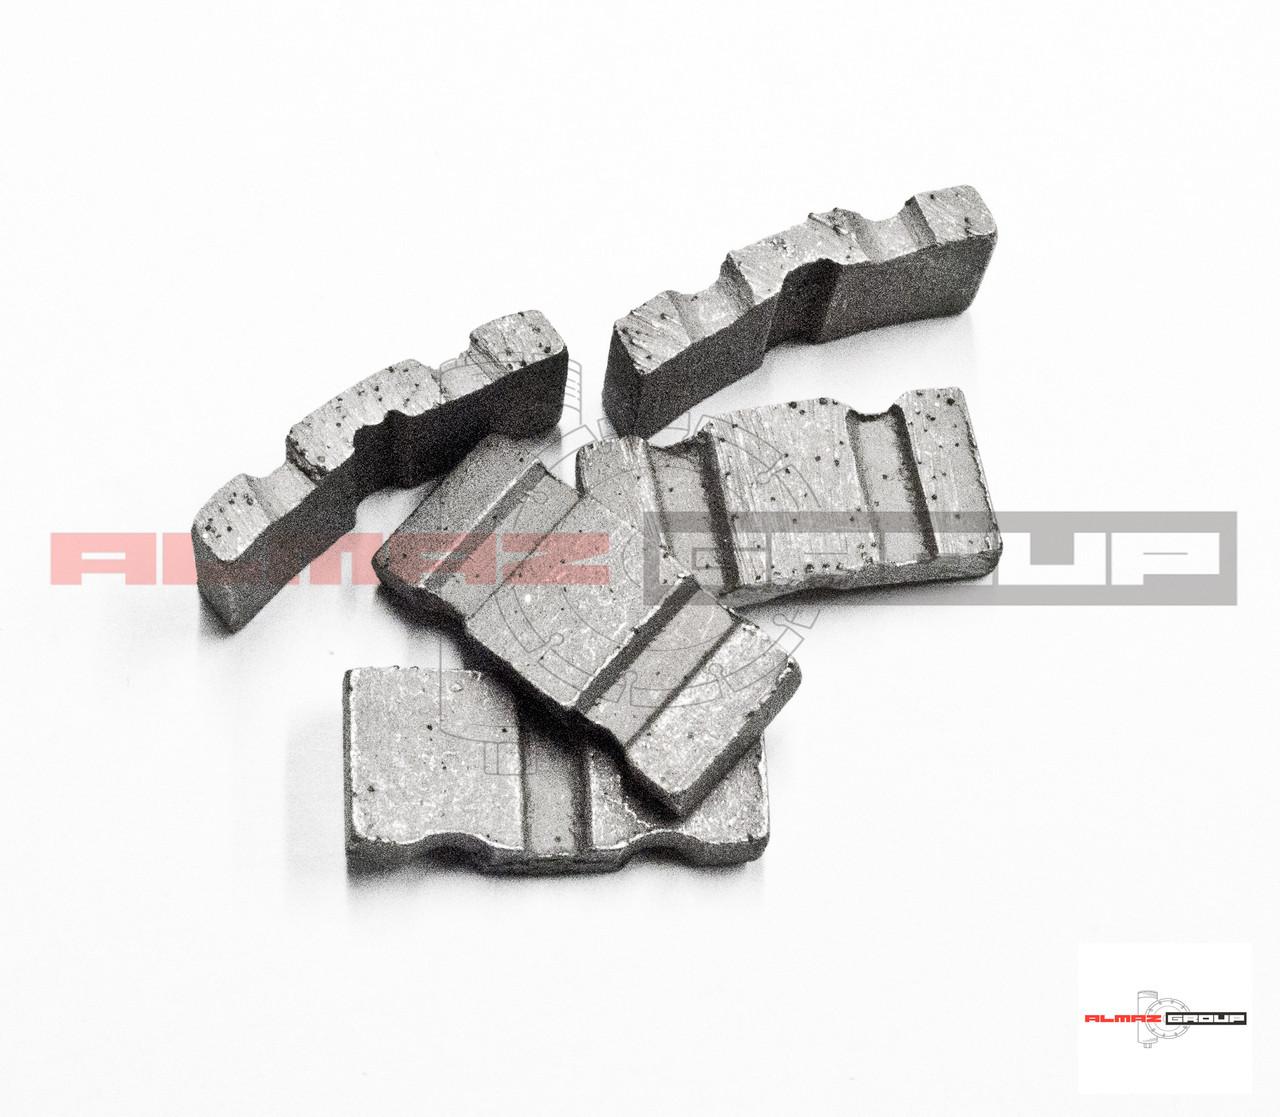 Реставрация алмазных коронок Ø 82 методом напайки сегмента  TURBO-X